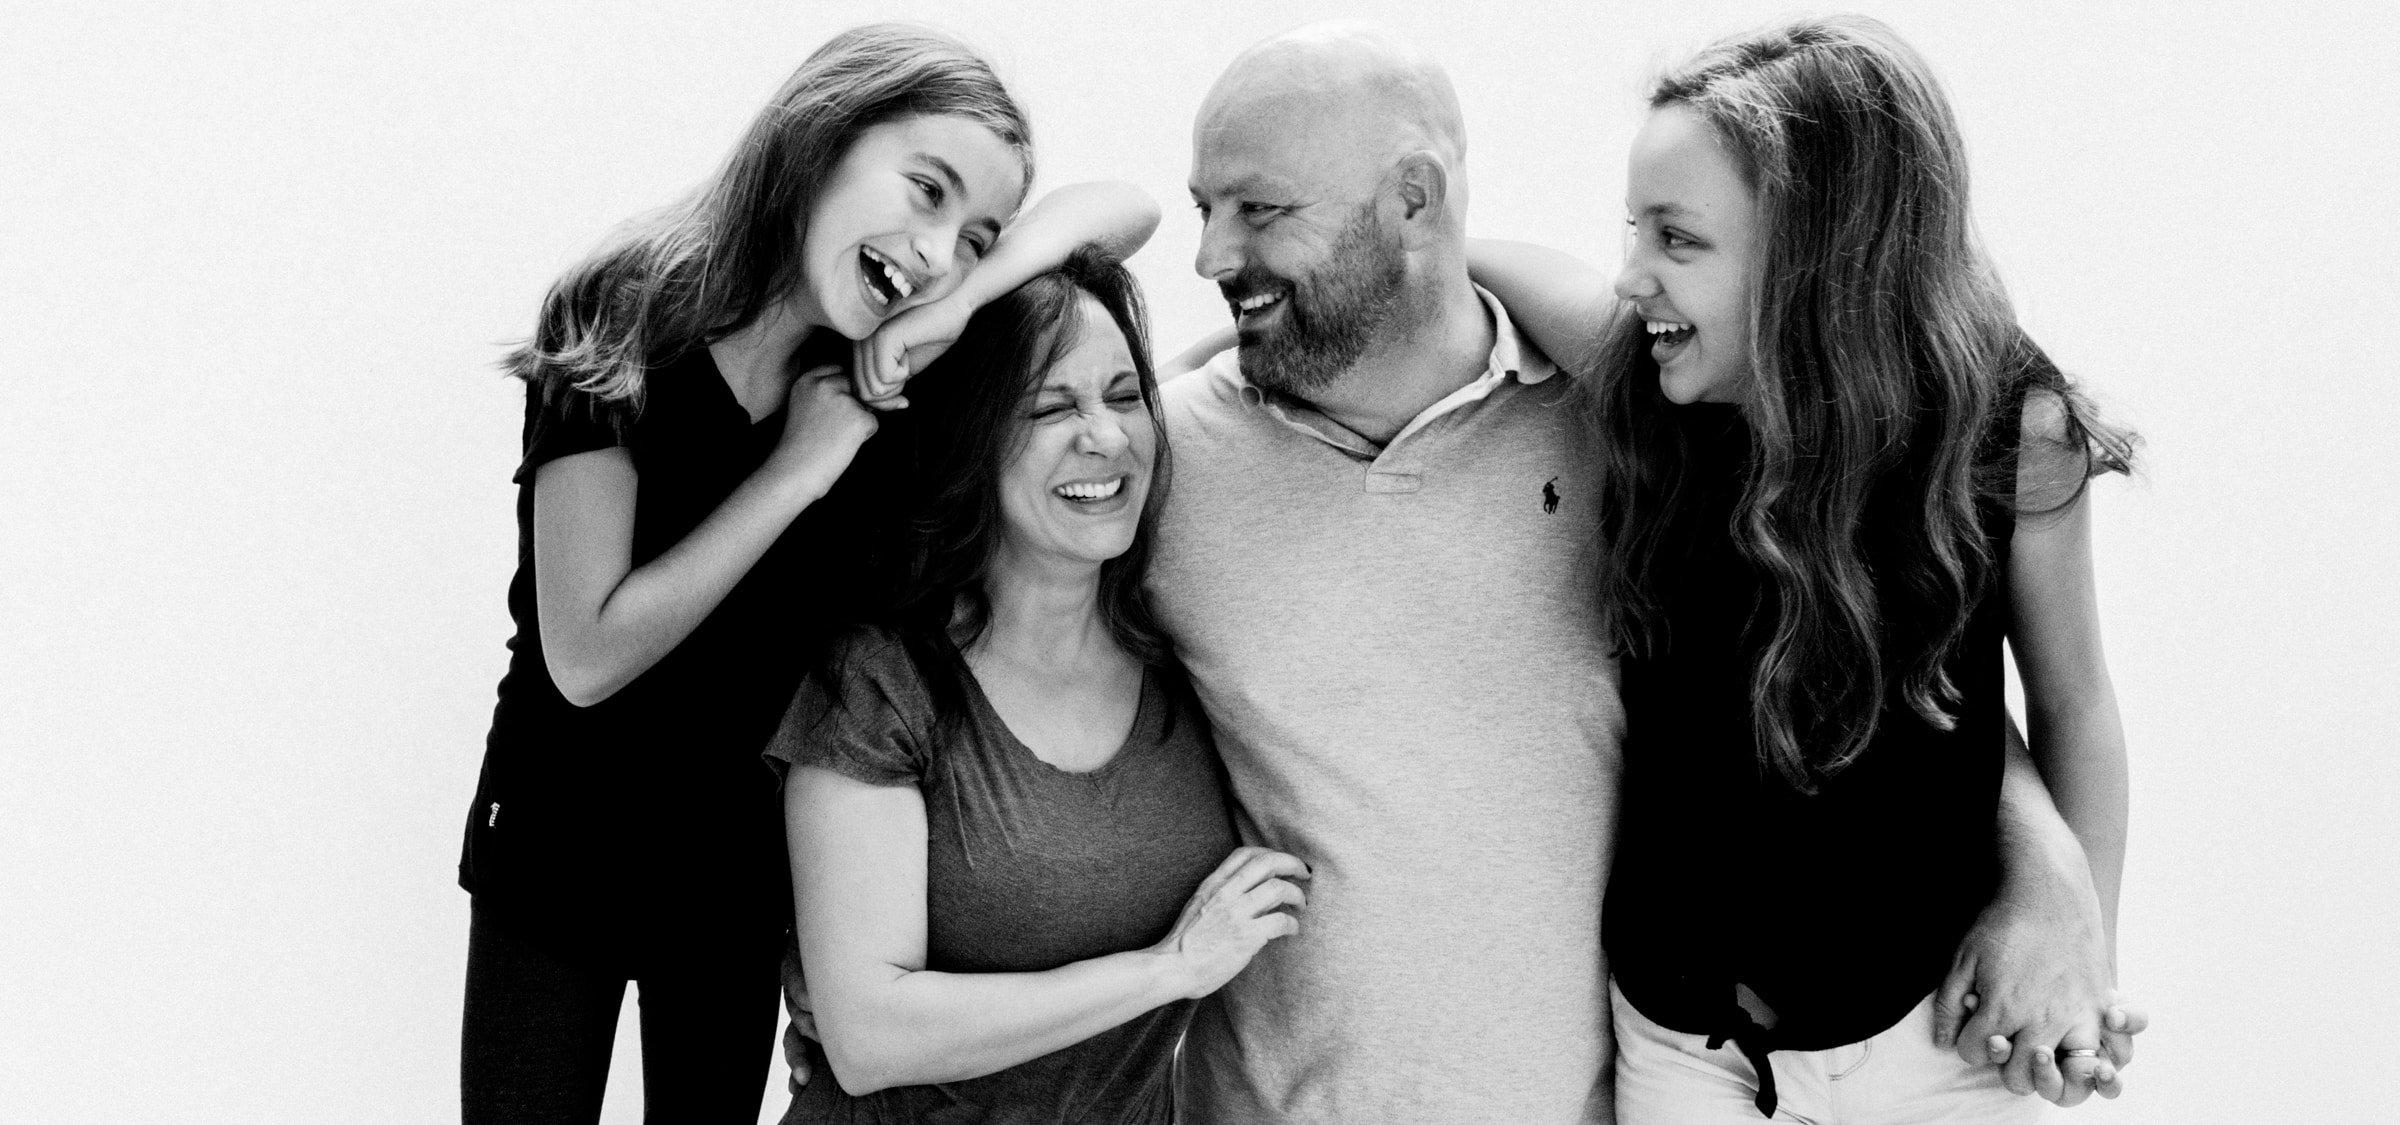 jpp family 2020 portrait bw 1 2